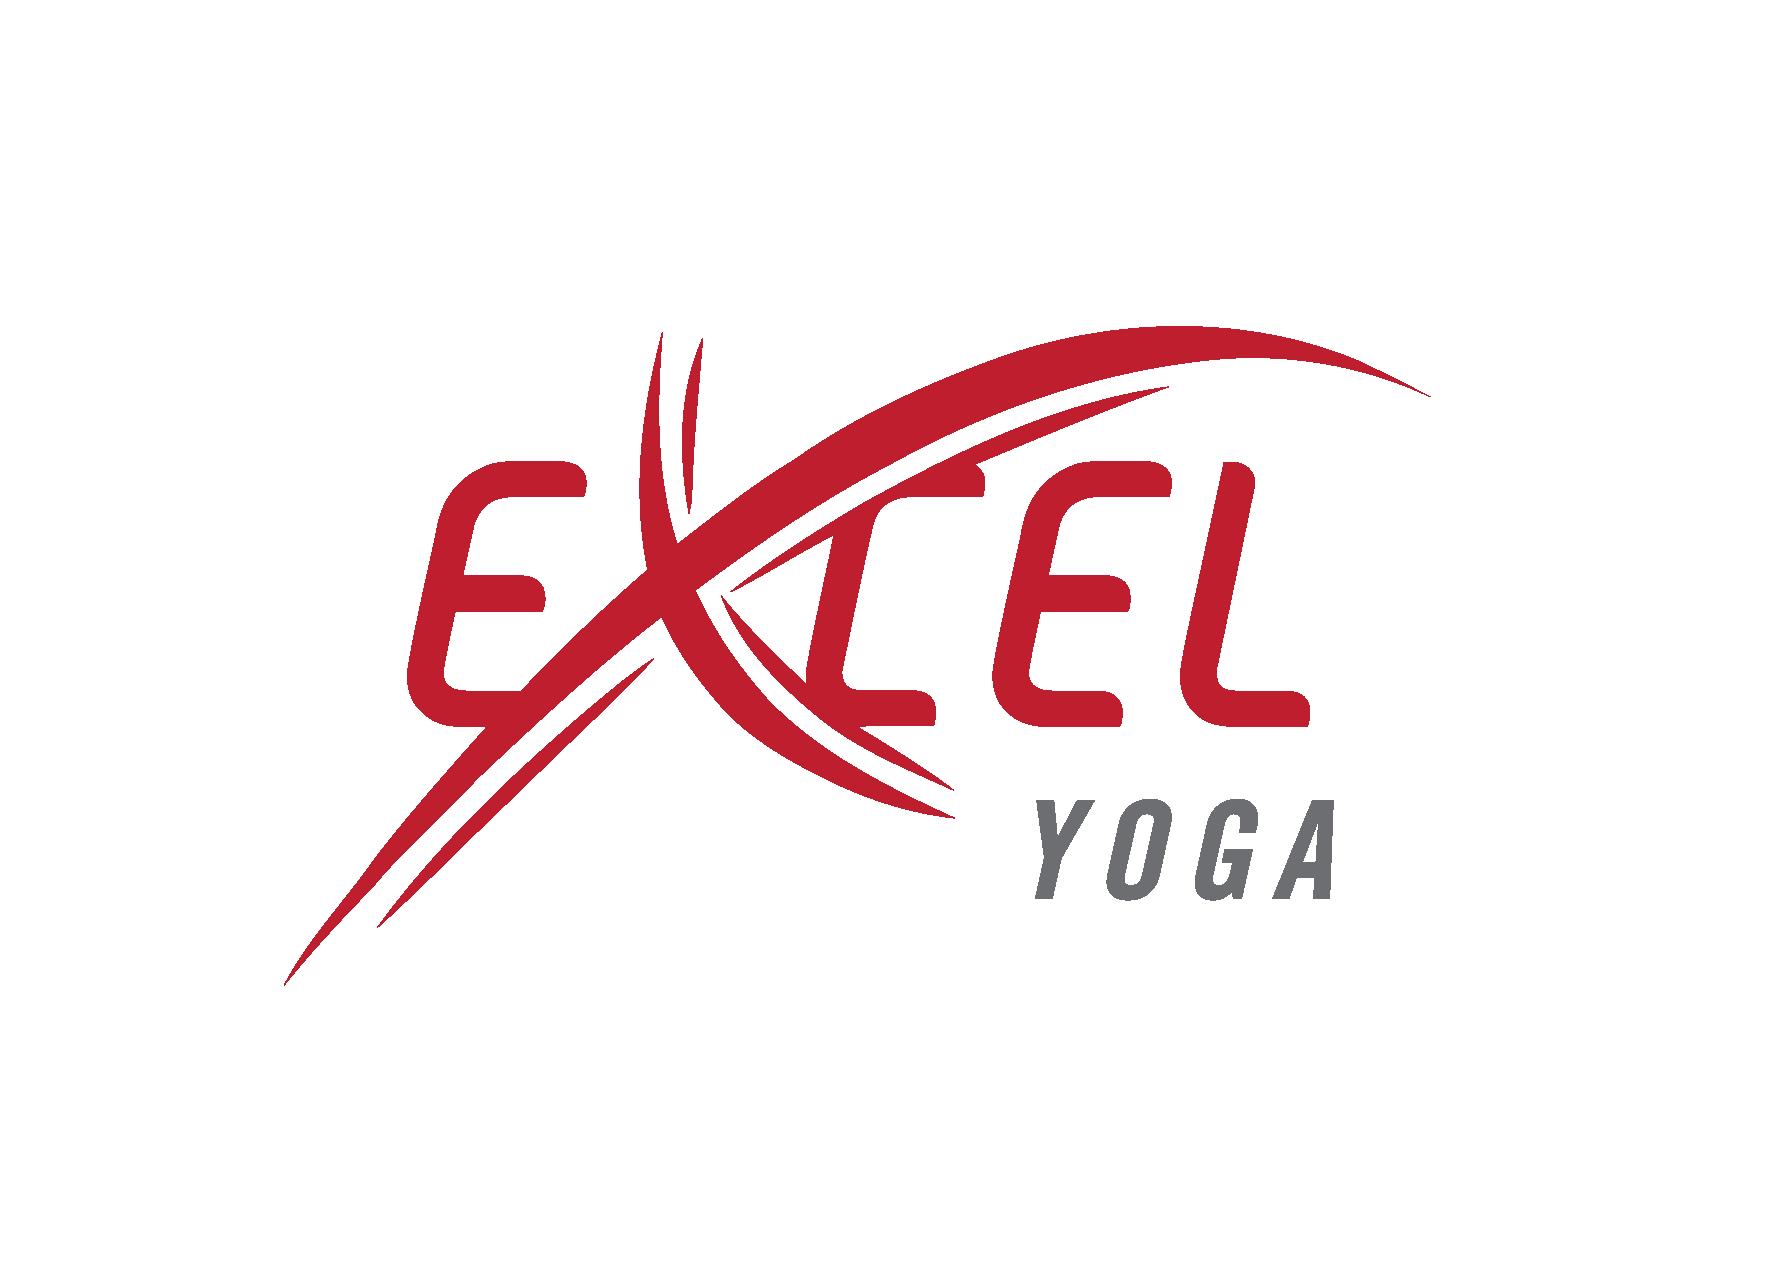 Excel_HF_Lockup_YOGA.png